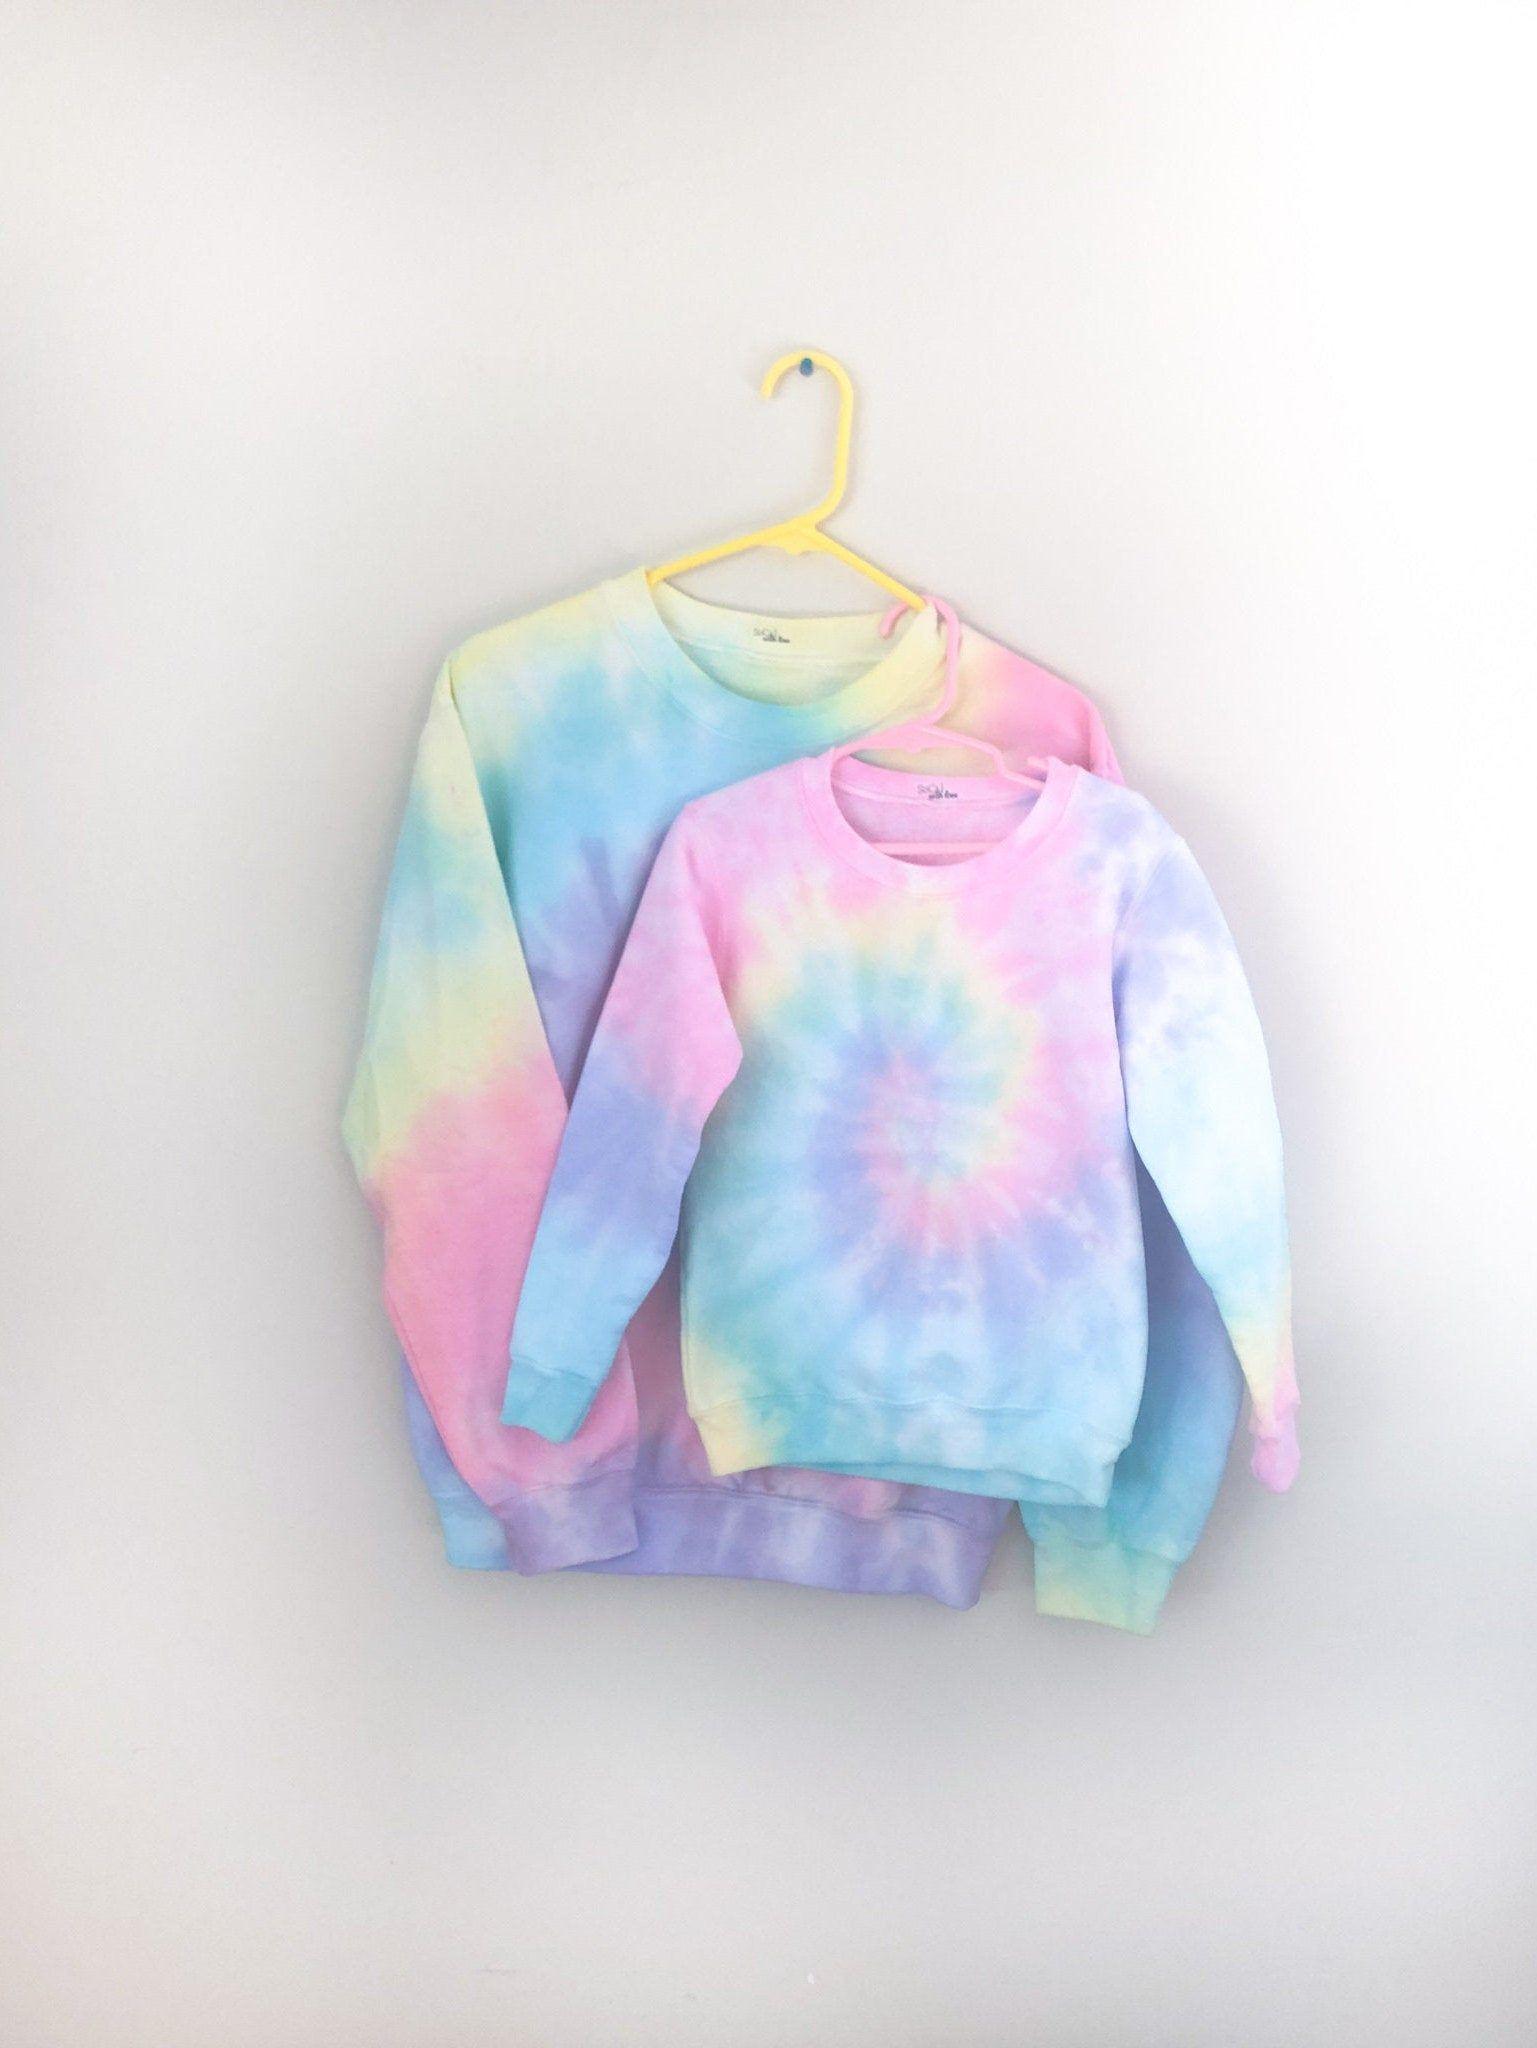 Socal Pastel Rainbow Mommy And Me Tie Dye Sweatshirts Light Etsy Tie Dye Sweatshirt Tie Dye Pastel Rainbow [ 2048 x 1537 Pixel ]